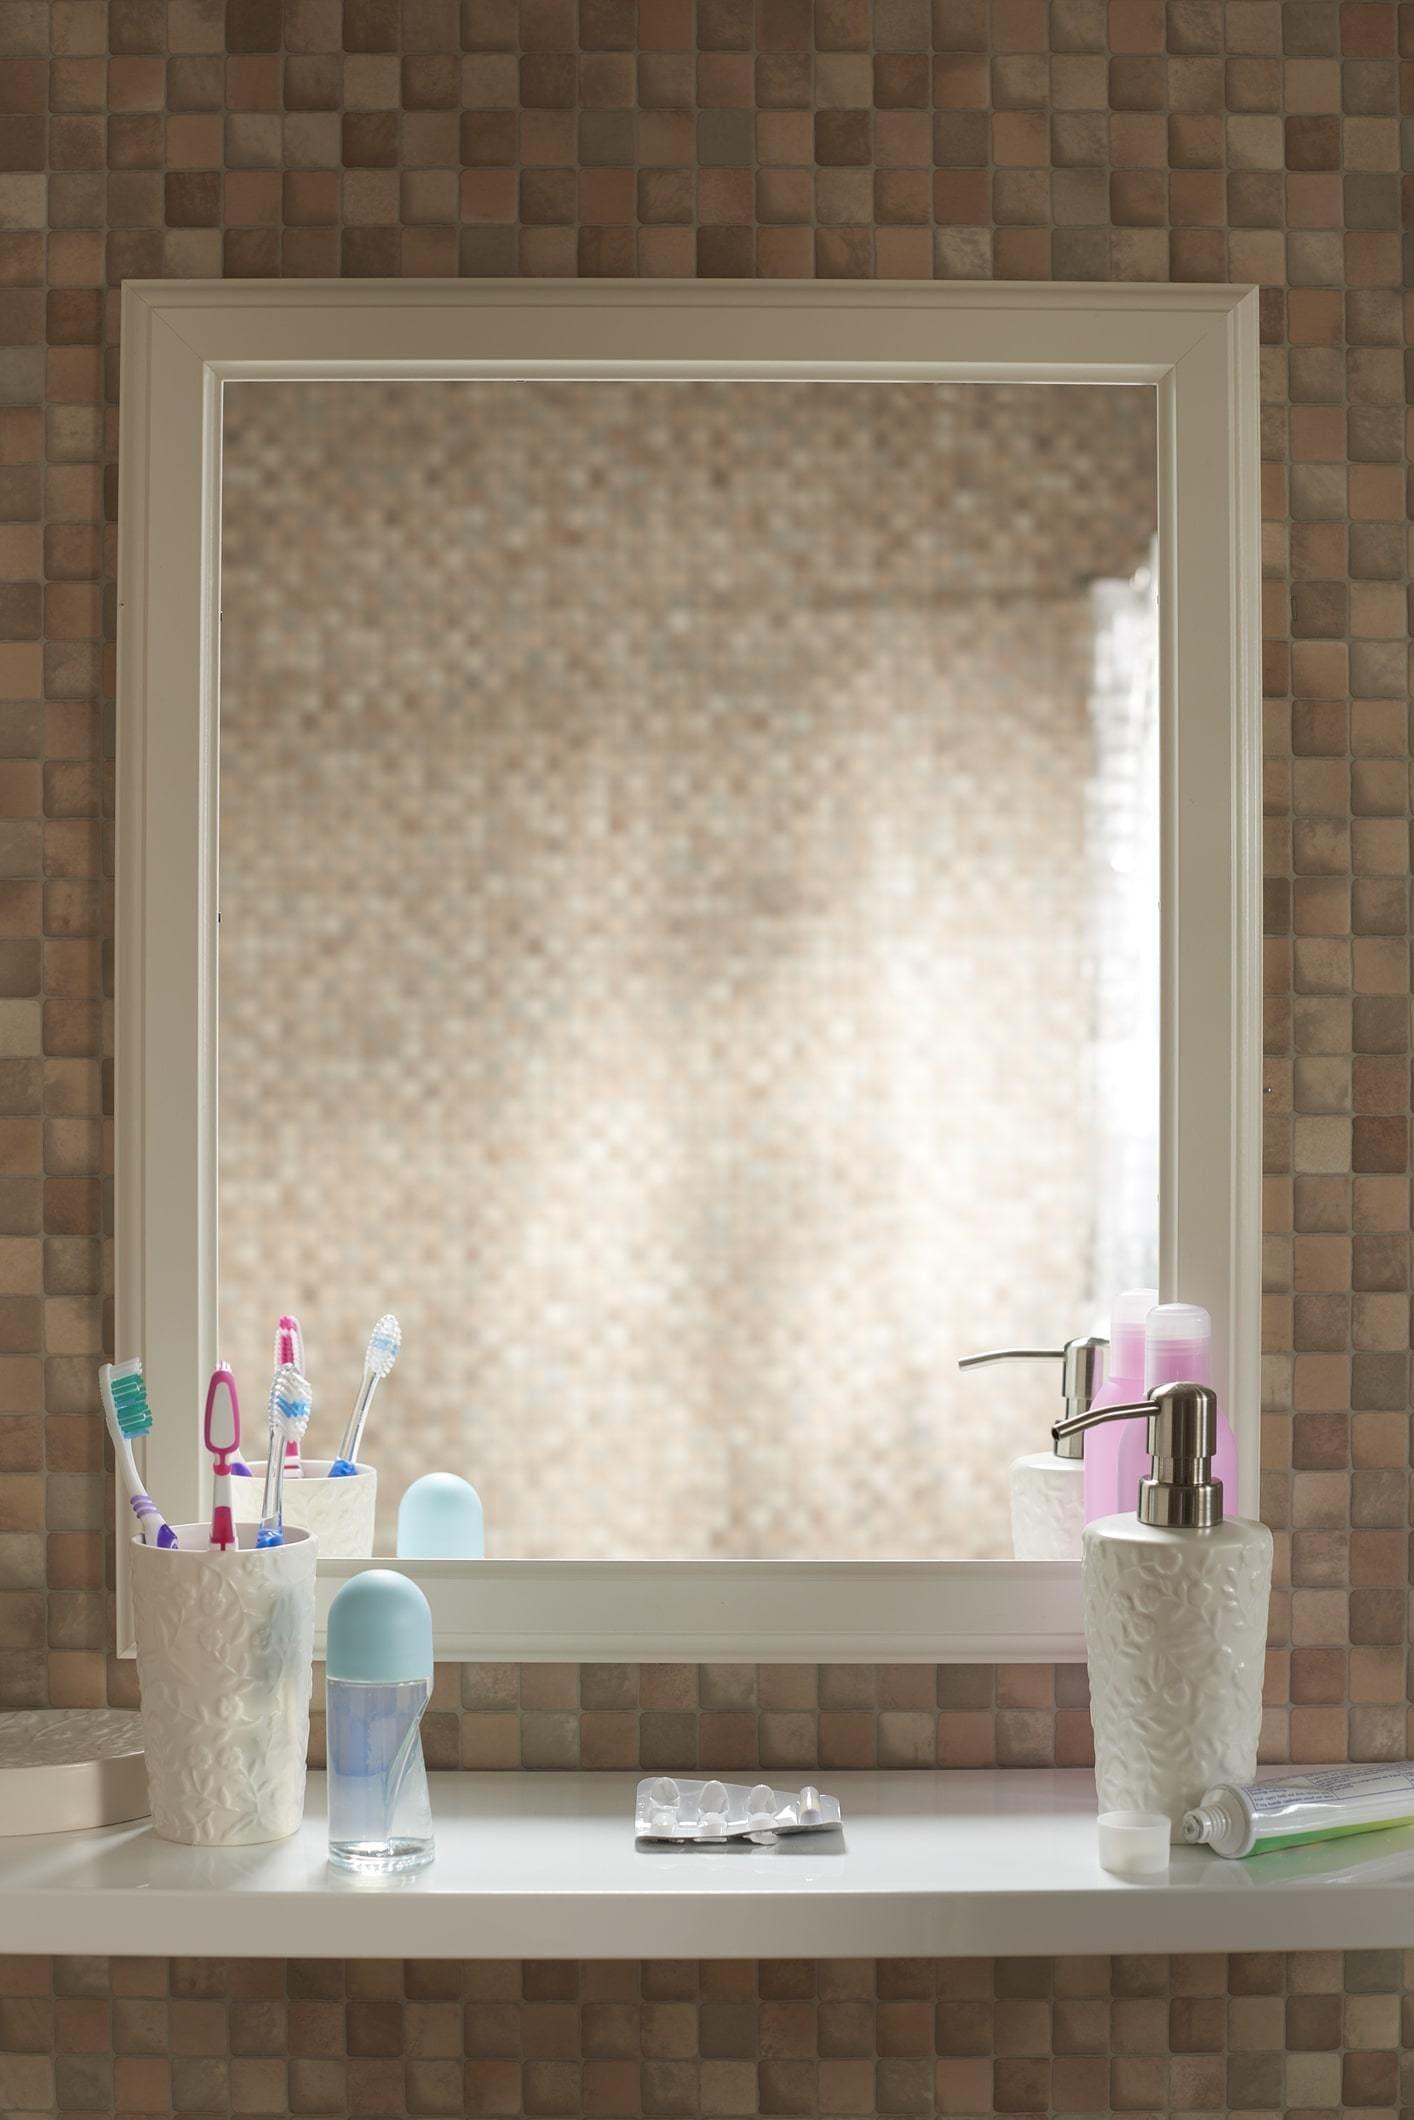 signature hairstyle bathroom setup